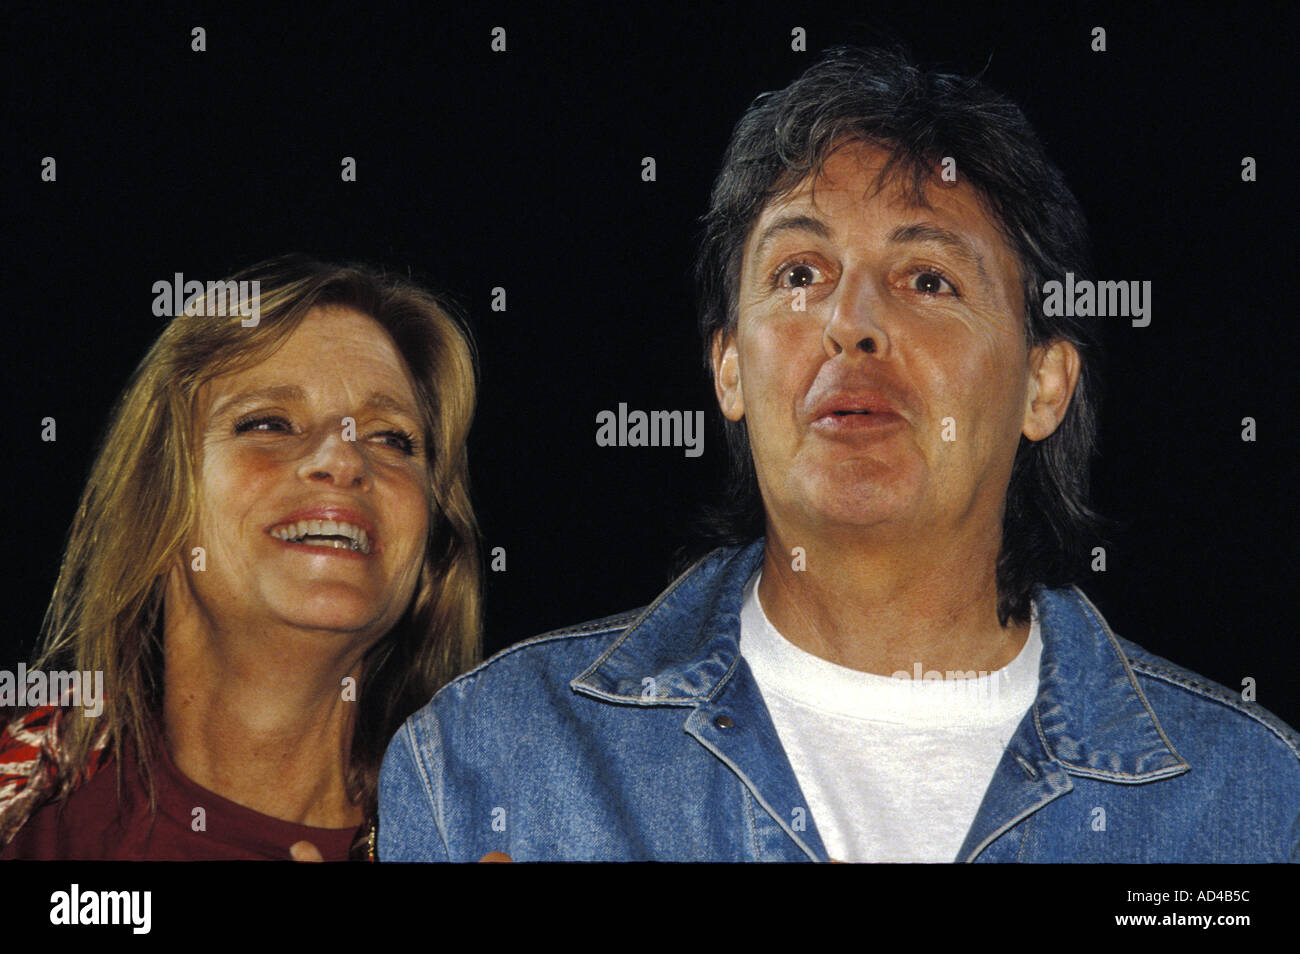 EX-BEATLE SINGER Sir Paul McCartney WITH LATE WIFE Linda McCartney performing in London,UK - Stock Image